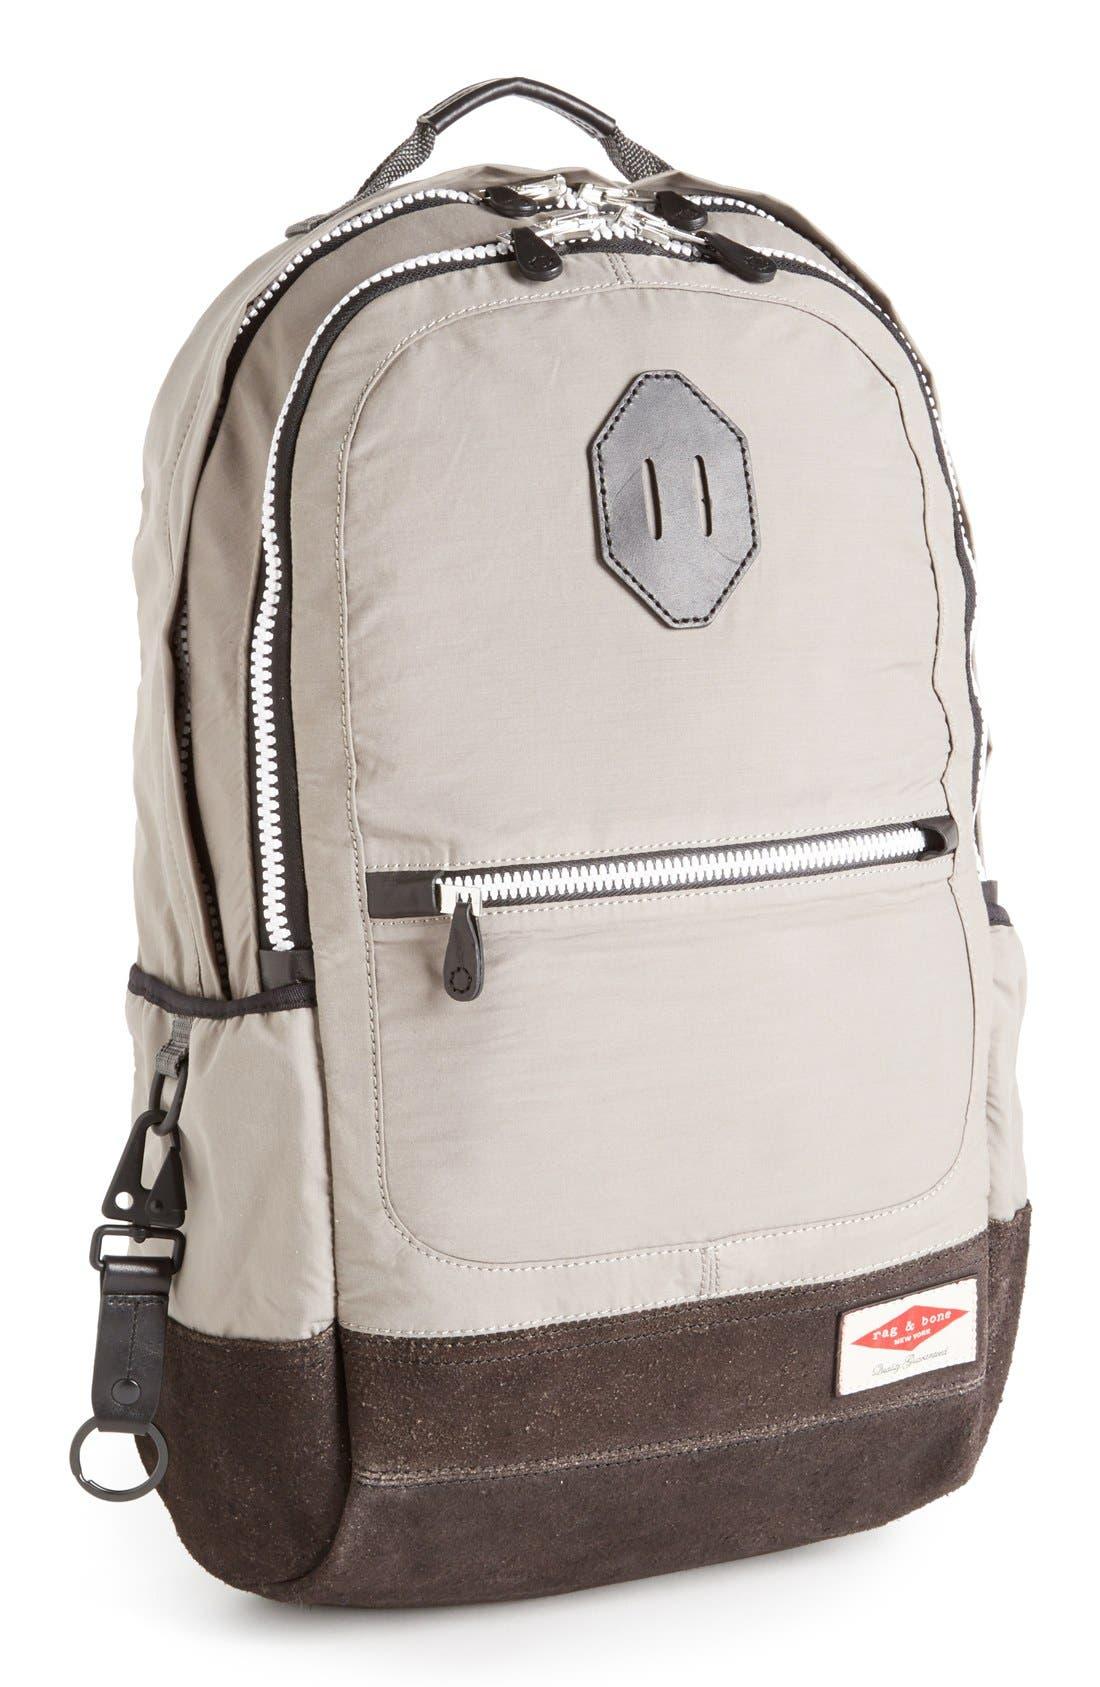 Alternate Image 1 Selected - rag & bone 'Sporty' Backpack